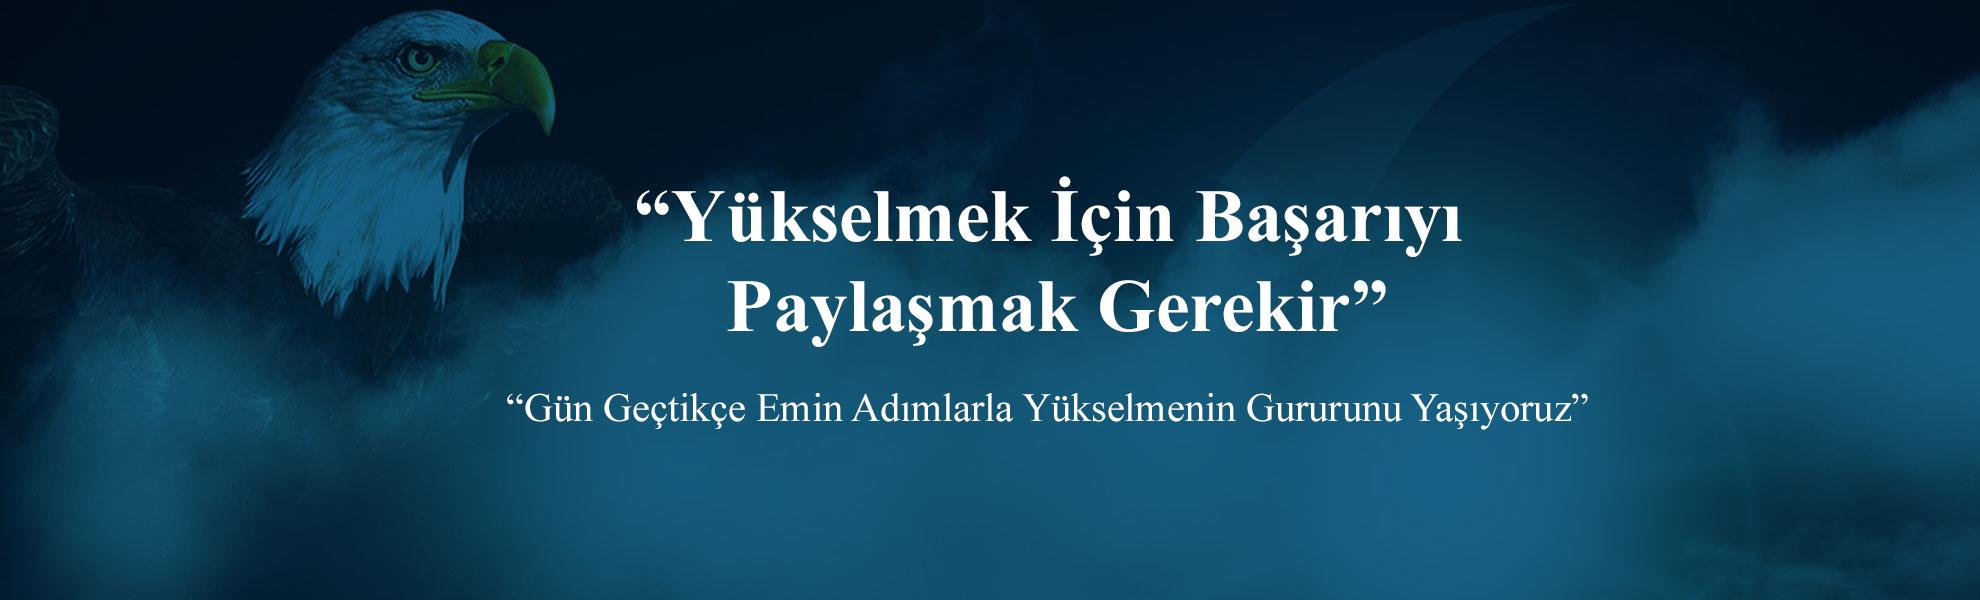 ekerasansor-banner.jpg